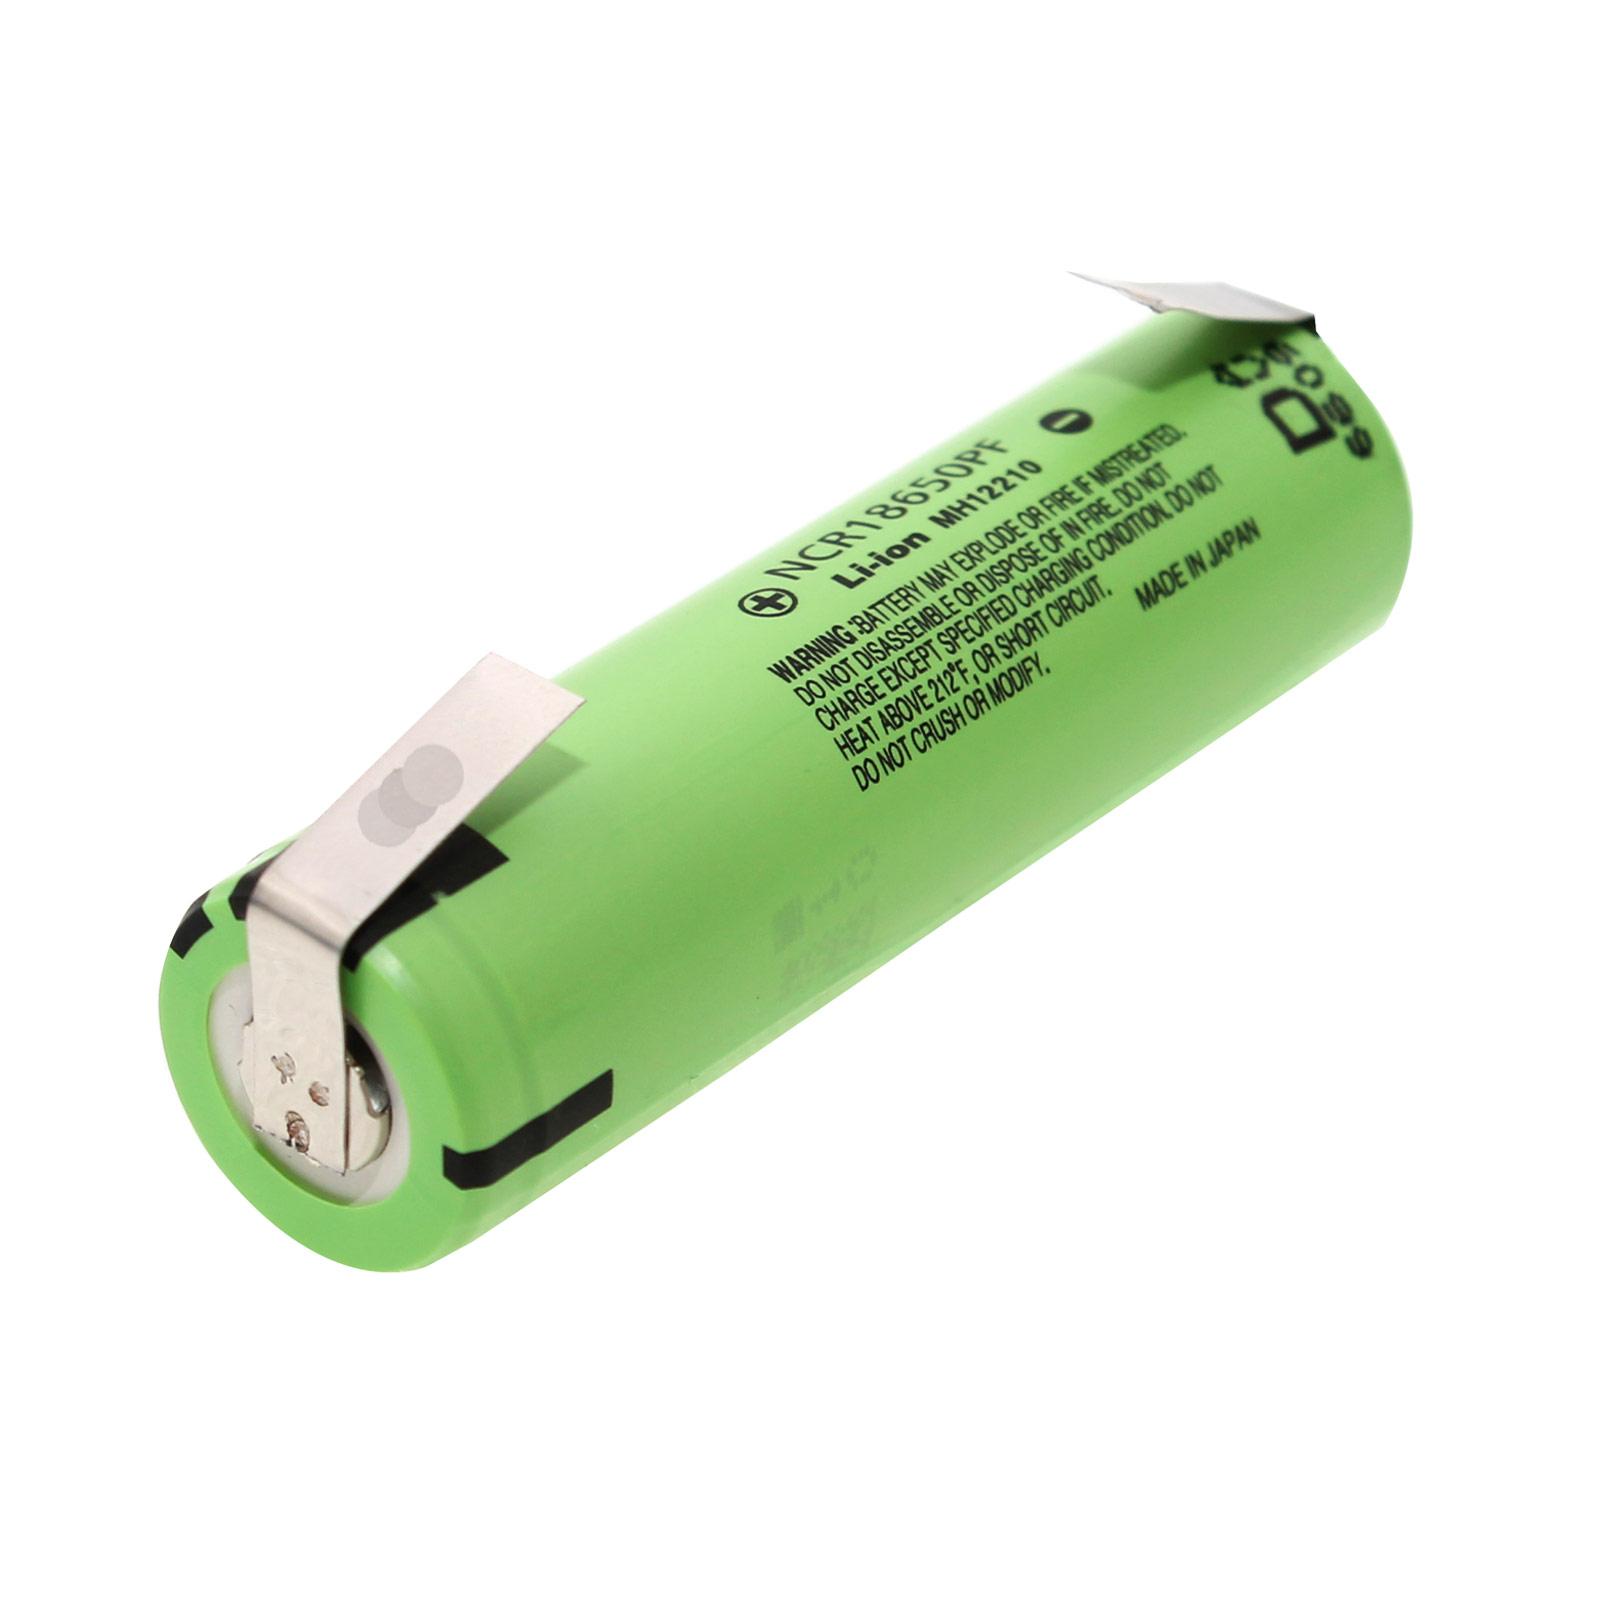 BT-SD 3,6//1 LI POWER Akku 3.7V 2200mAh für EINHELL RT-SD 3,6//1 LI